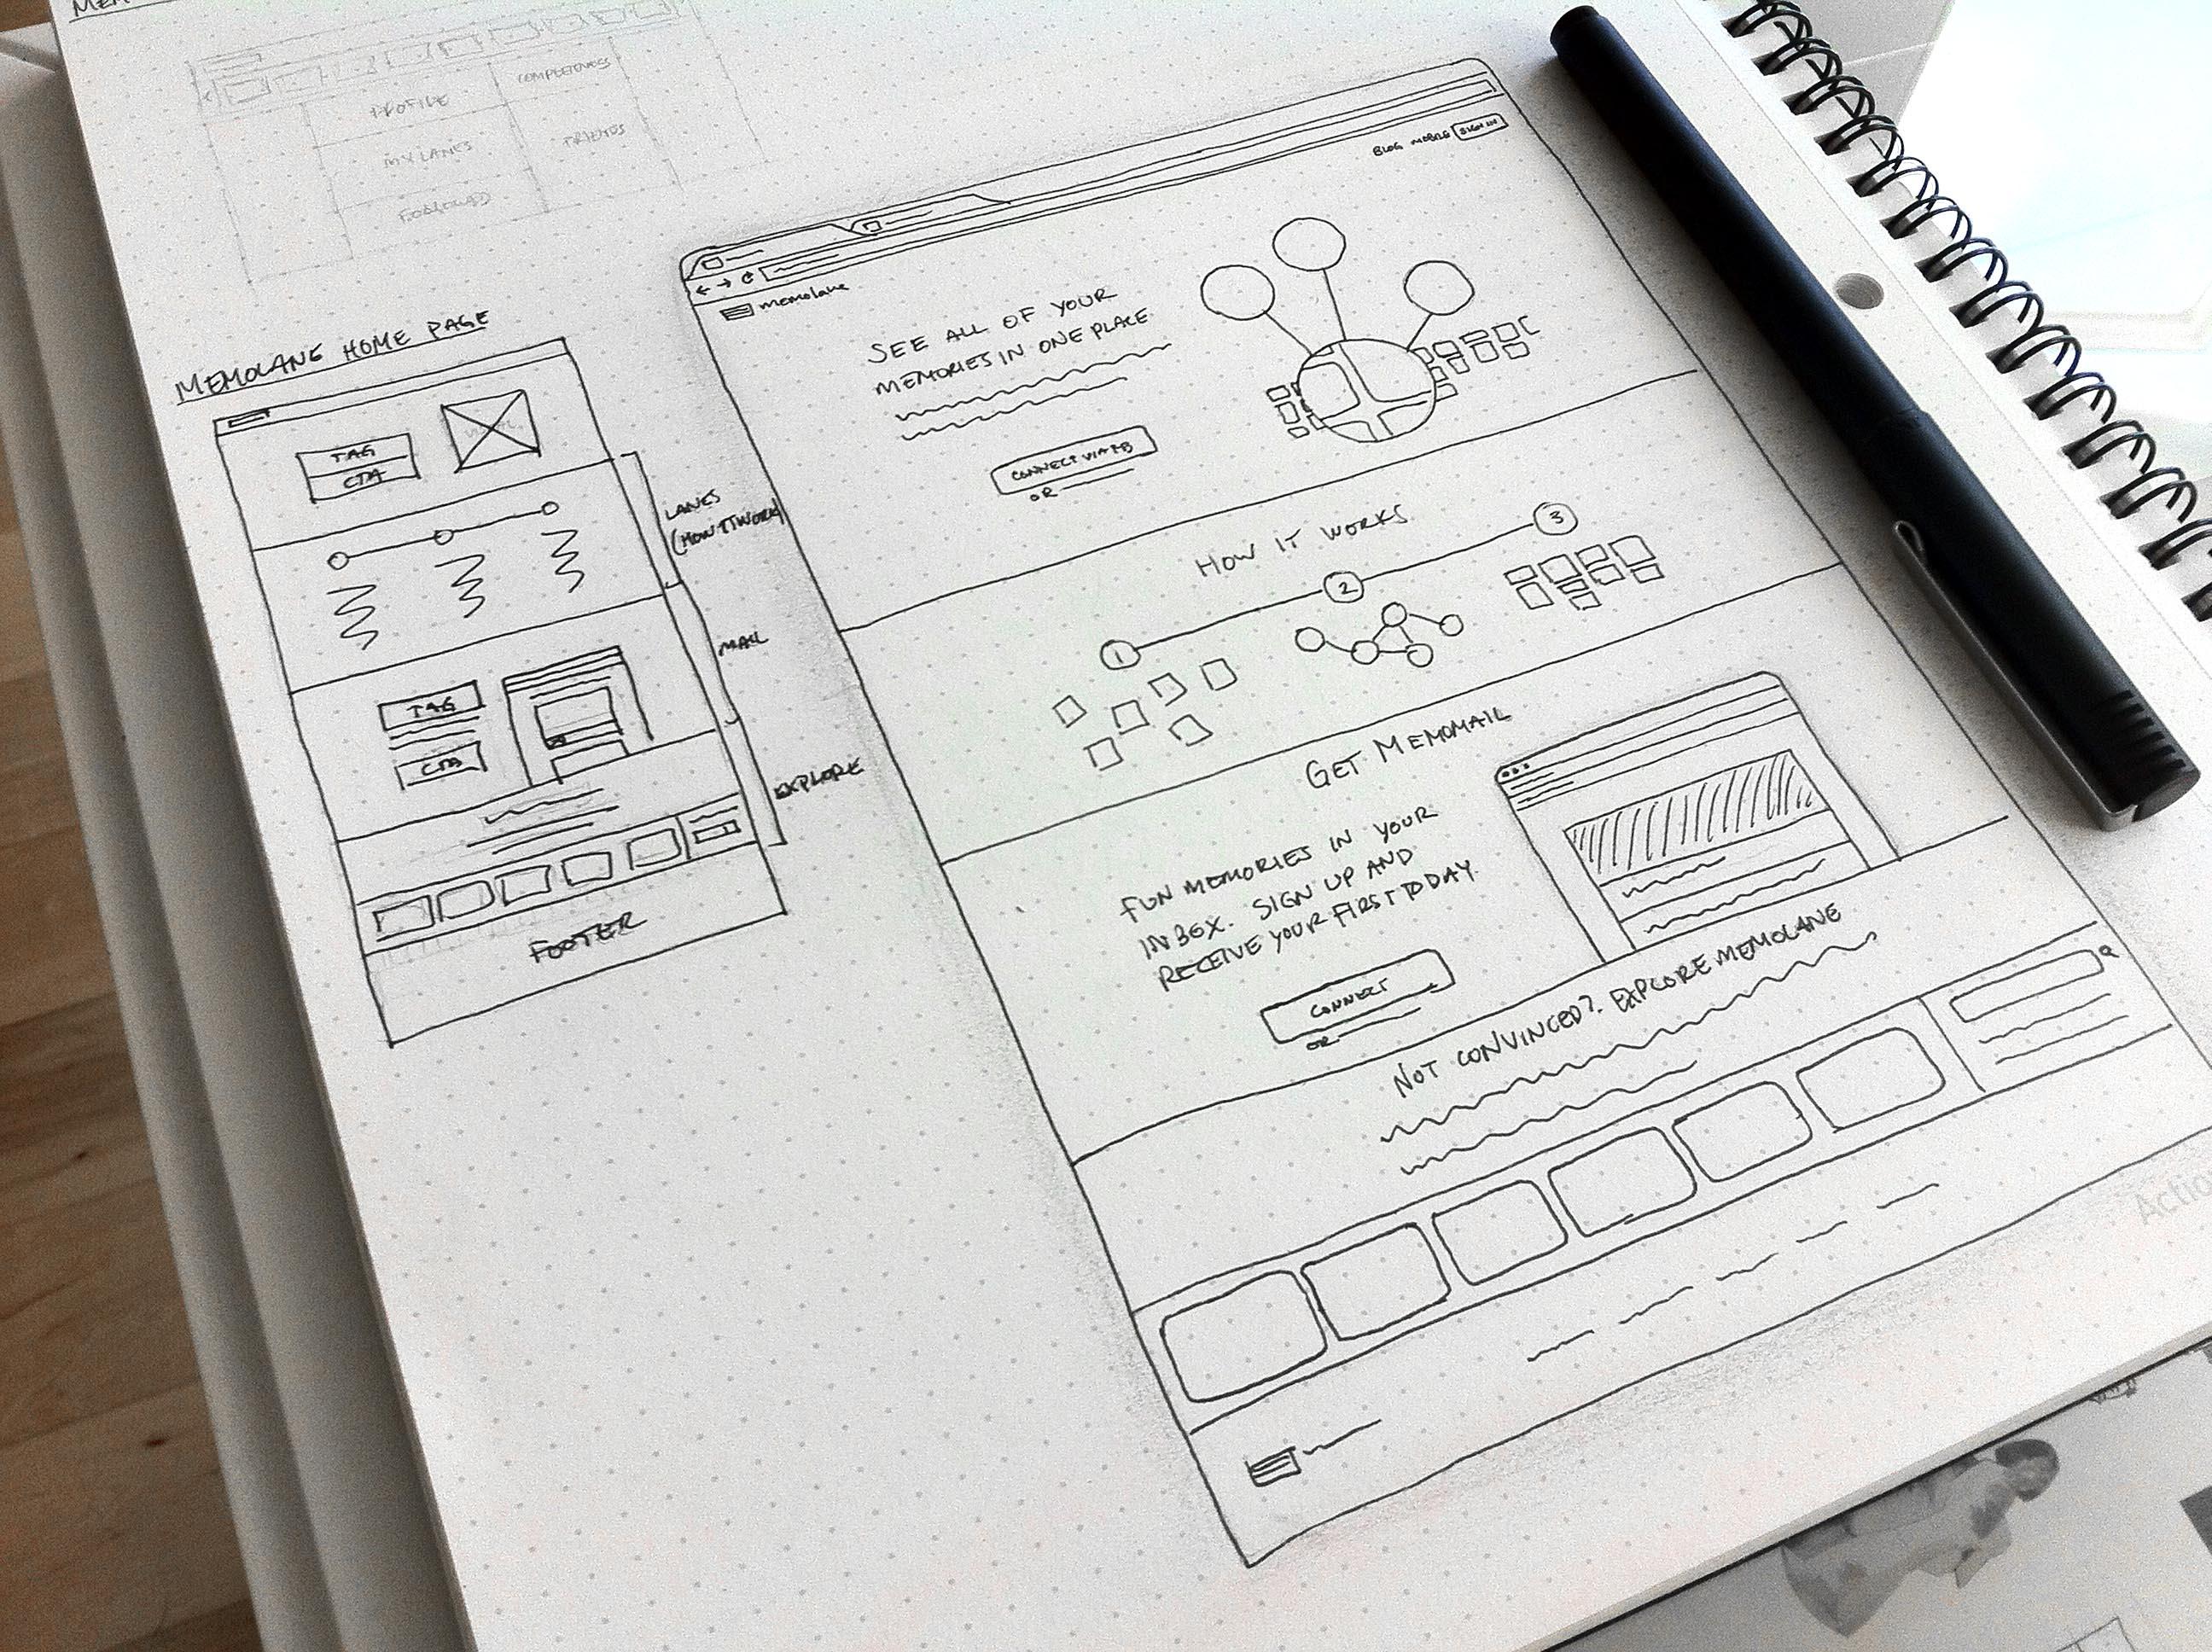 Ui Sketch Template Memolane Landing Page Wireframe Sketch